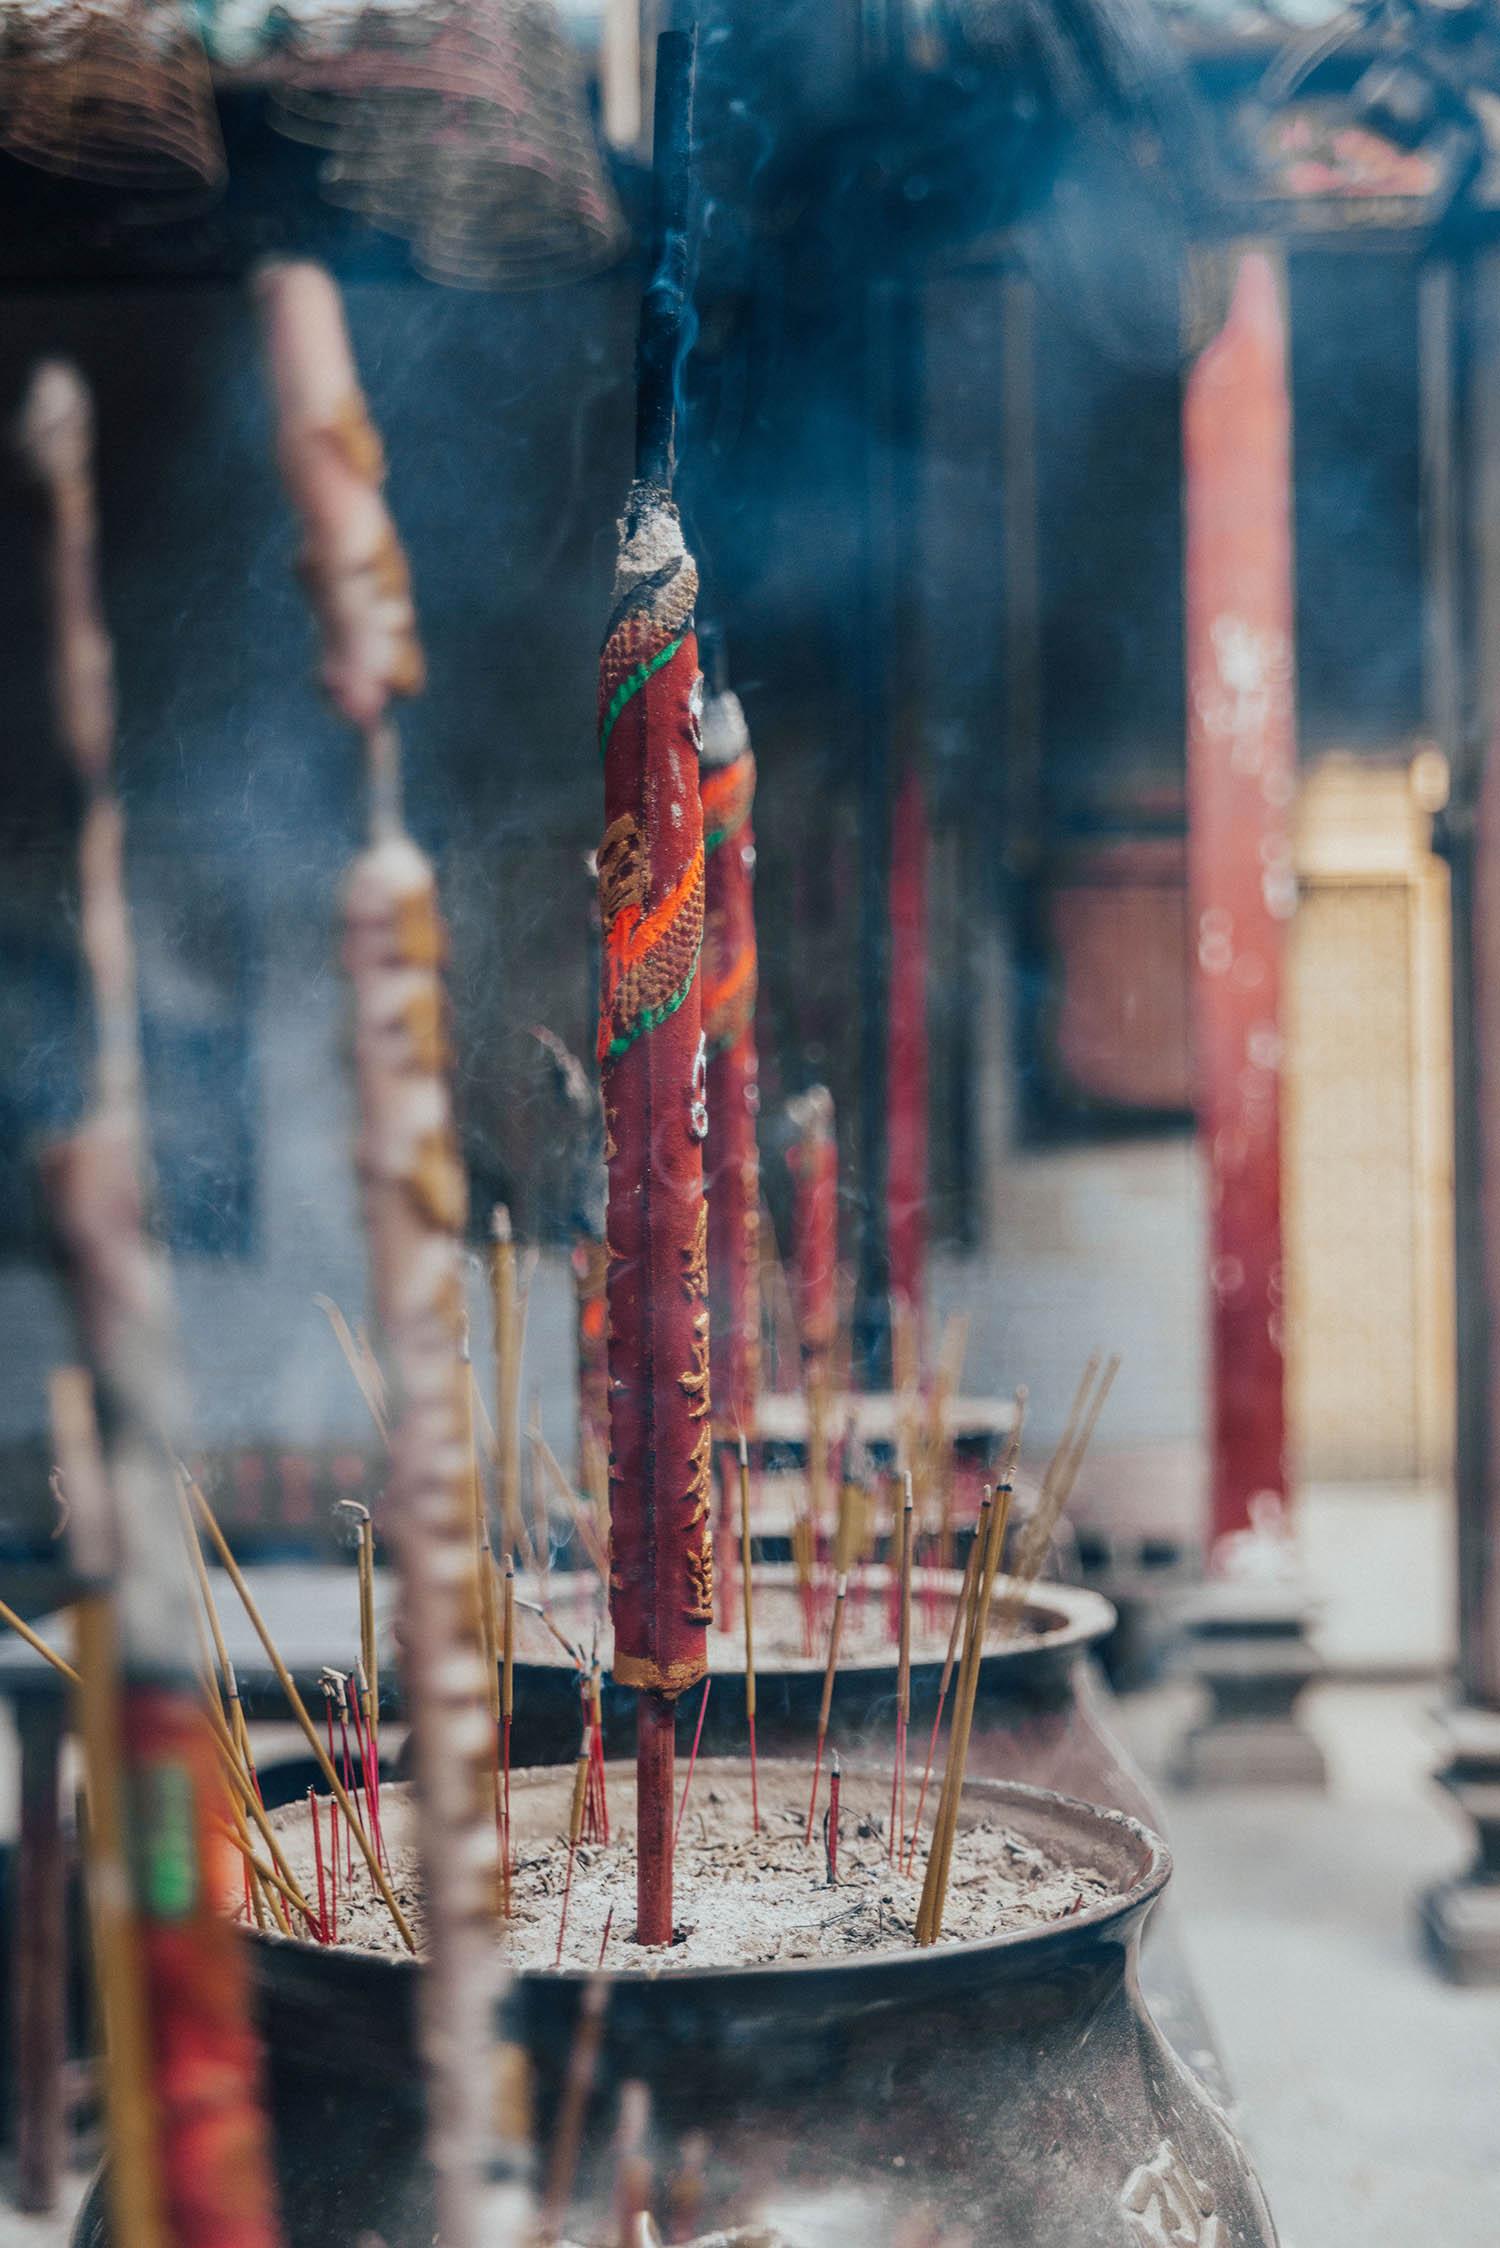 Incense at Thien Hau Pagoda - Buddhist Temple in Ho Chi Minh City / Saigon